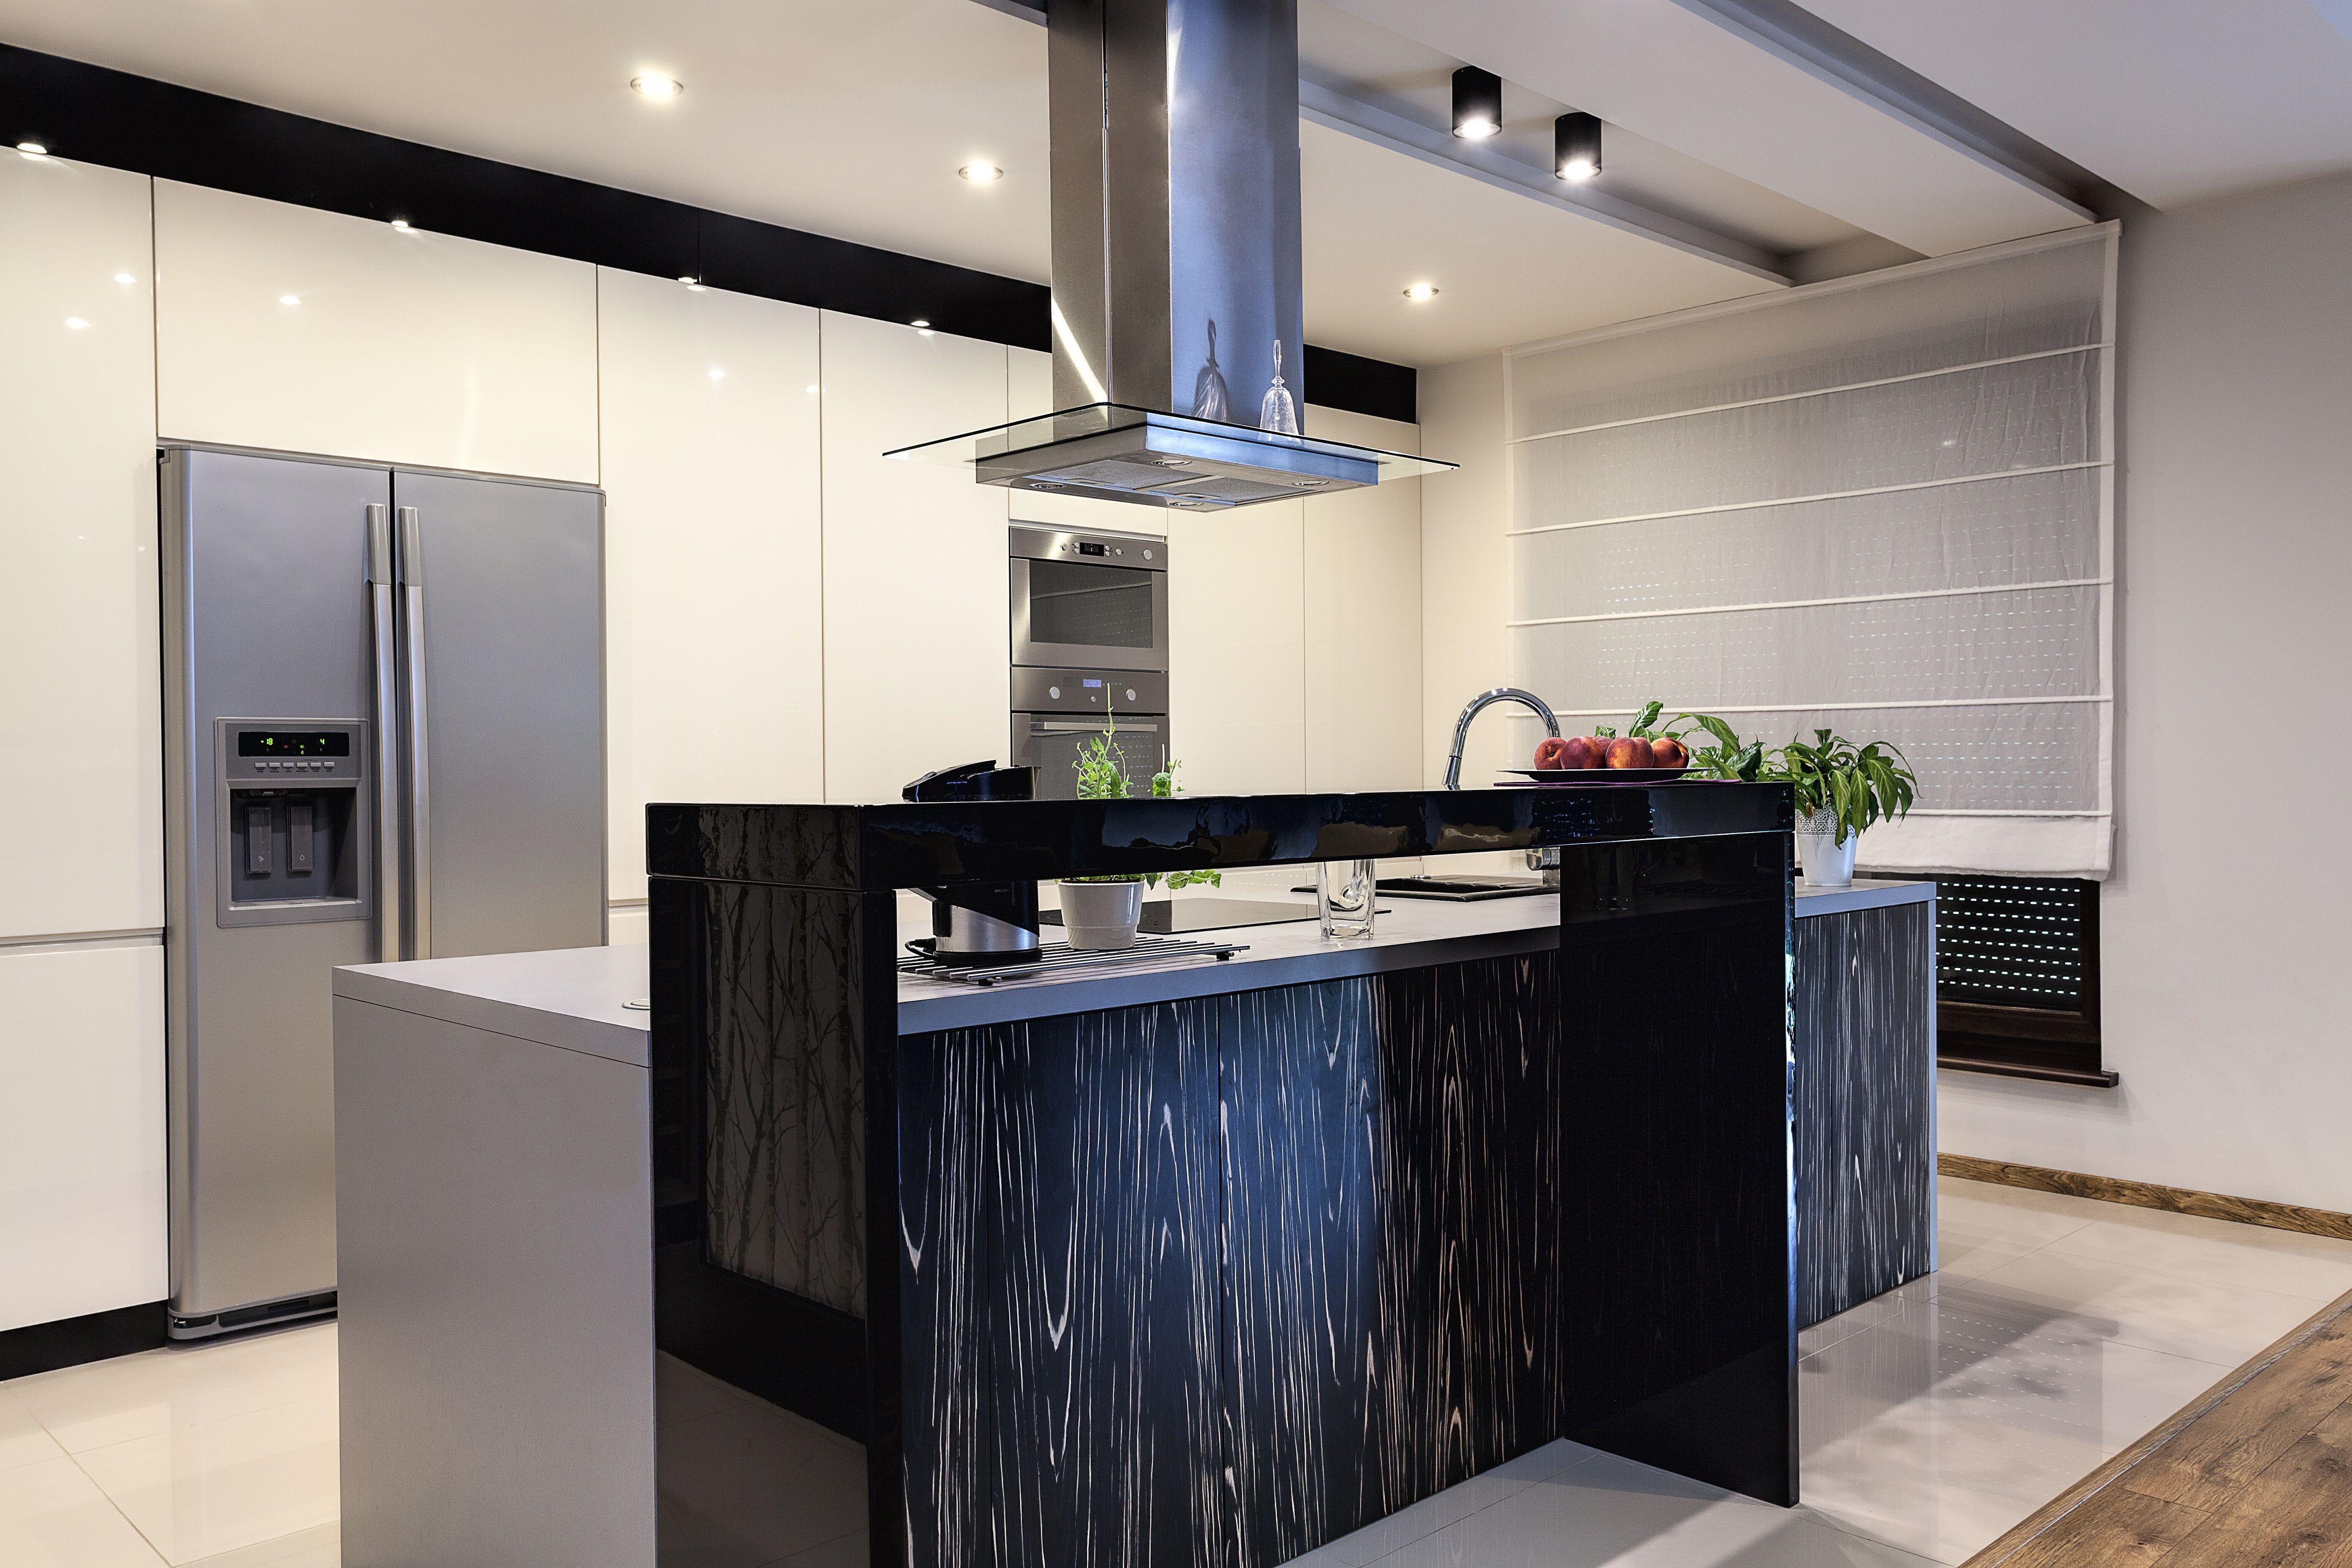 Küchendesign Ideen Fotogalerie - footballshaman.com - Home Design ...